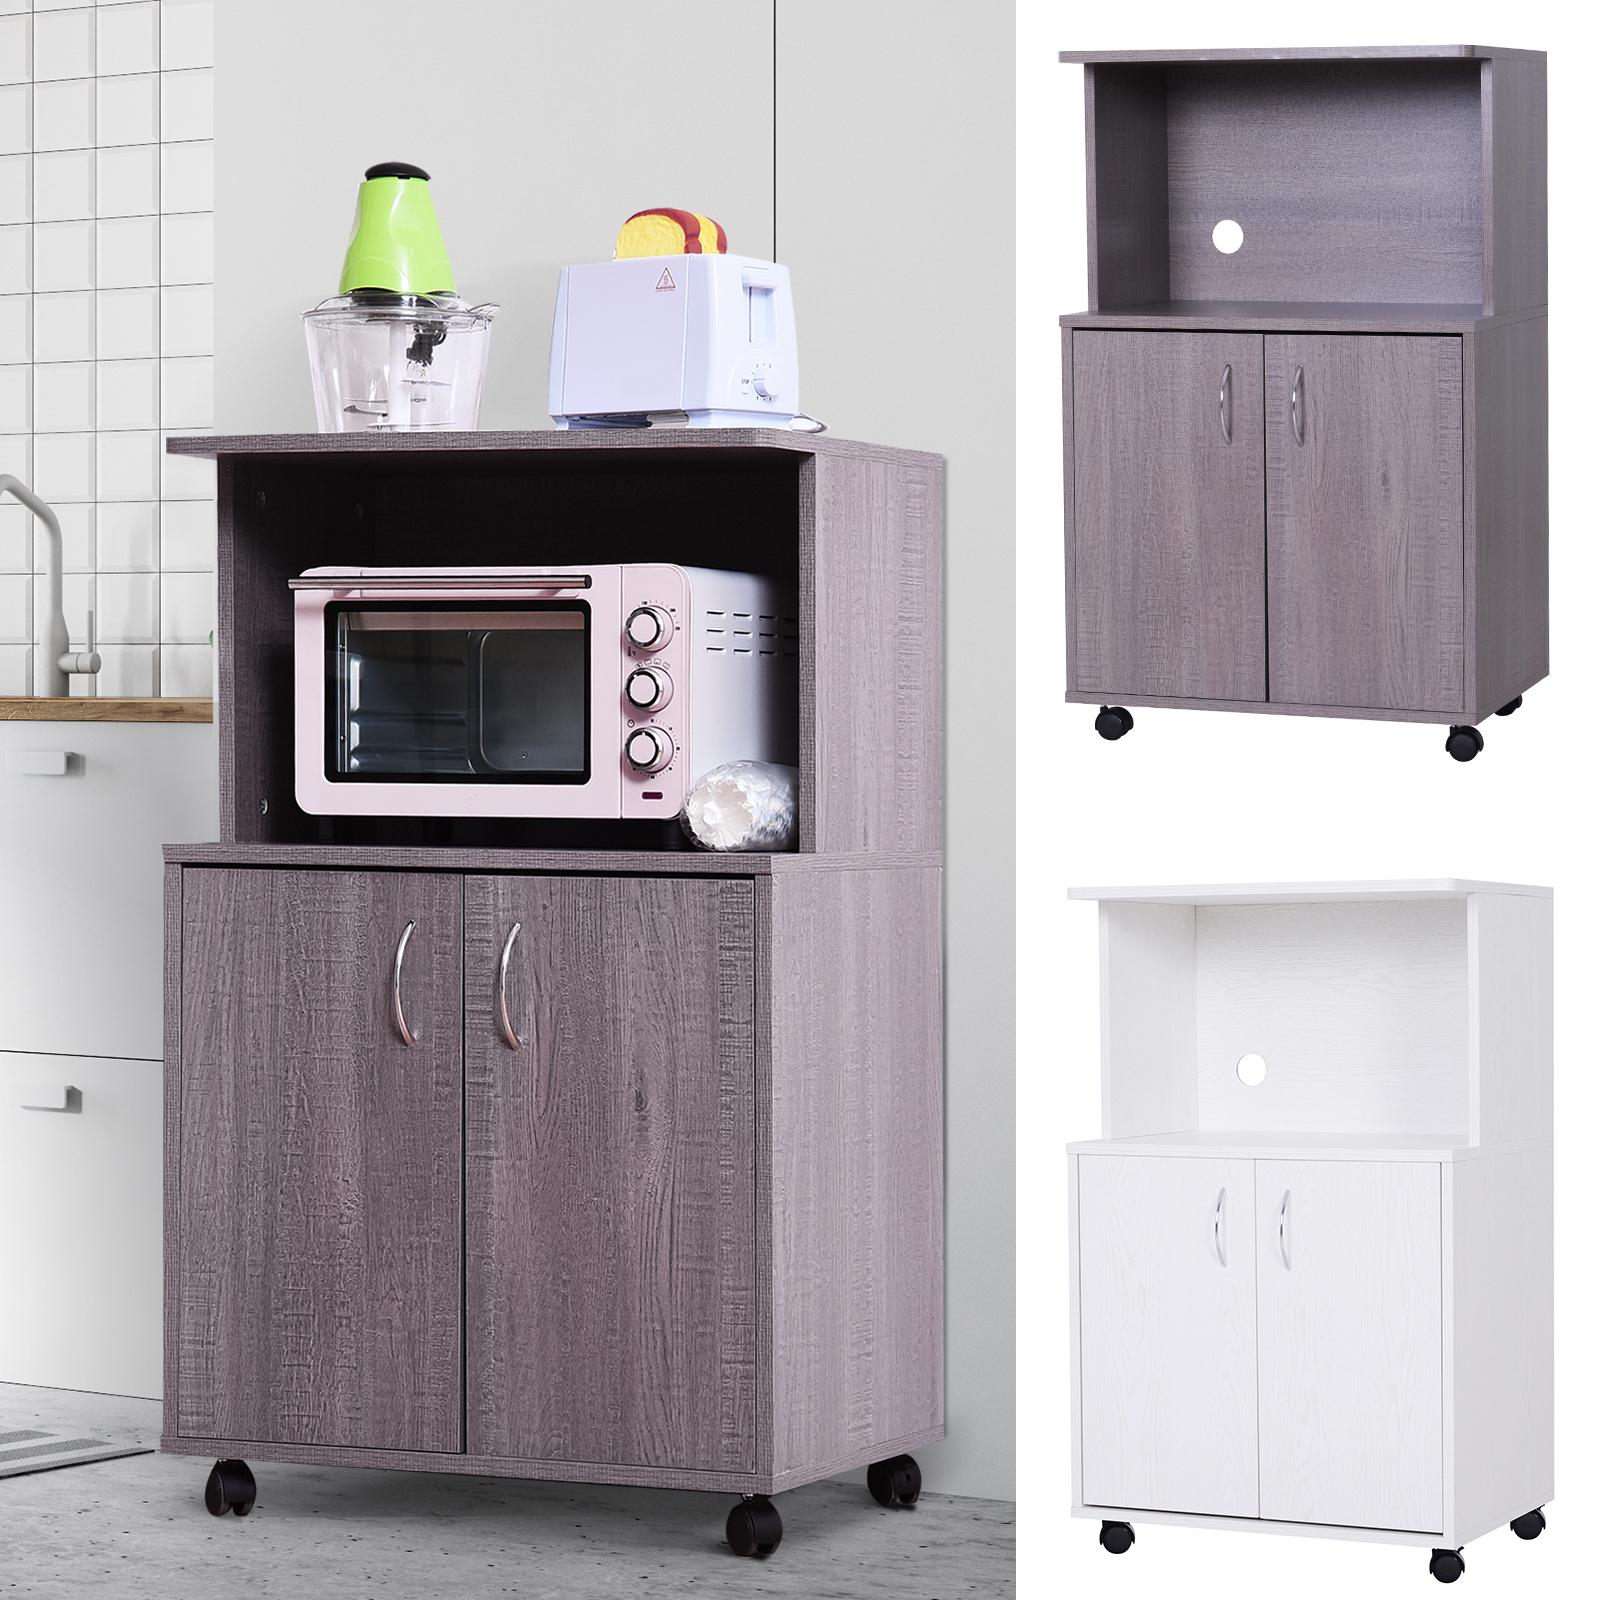 details about rolling kitchen trolley microwave cart 2 door cabinet storage shelves w wheels